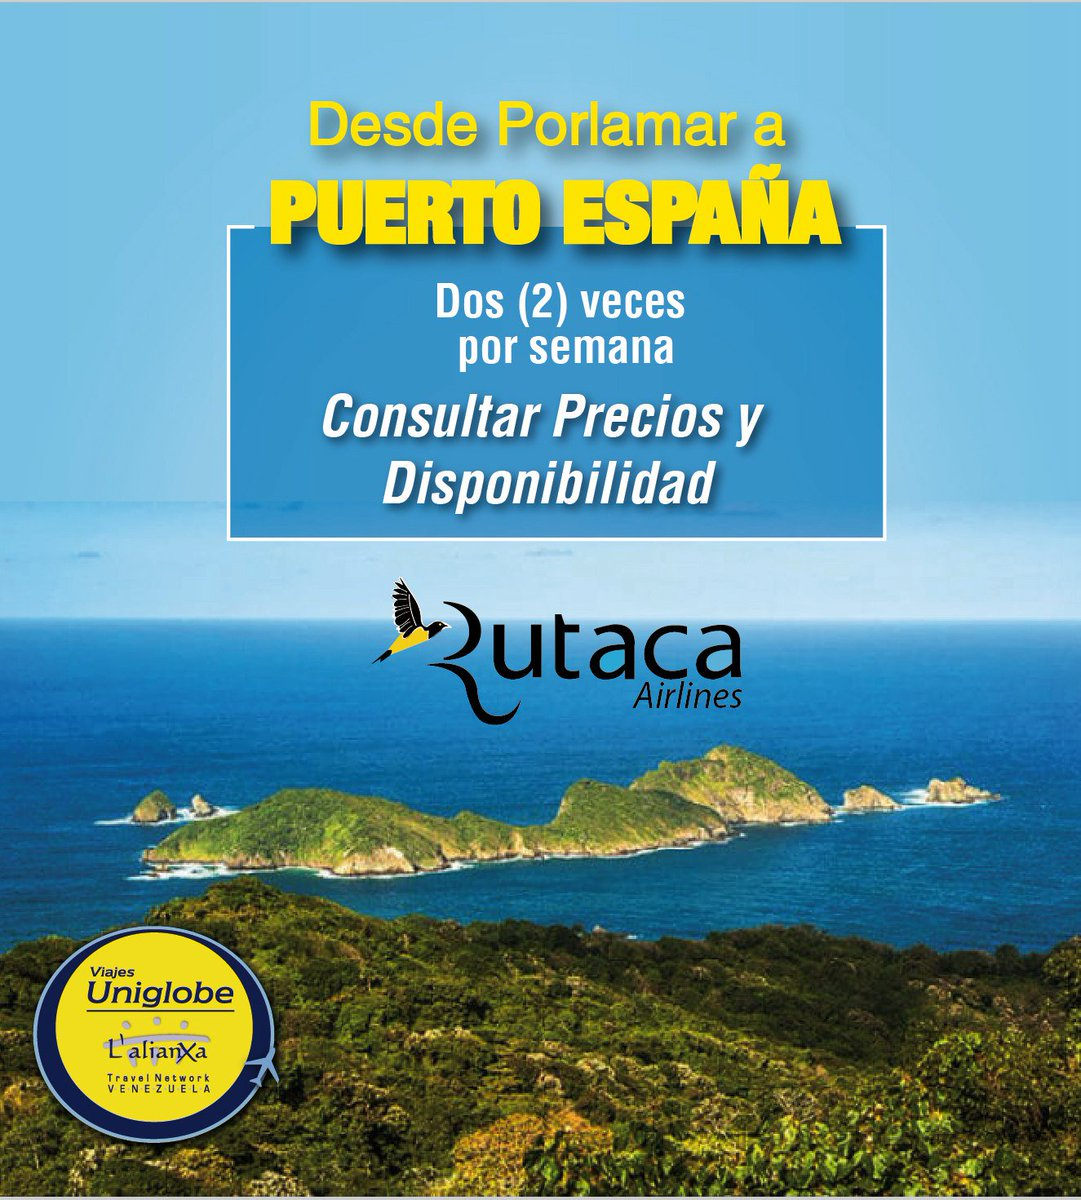 #Puertoespaña con con @rutaca #viajesuniglobe #turismo #travel #vacation #visiting #follow #like4like #instapohoto pic.twitter.com/BNjPQlNQrt